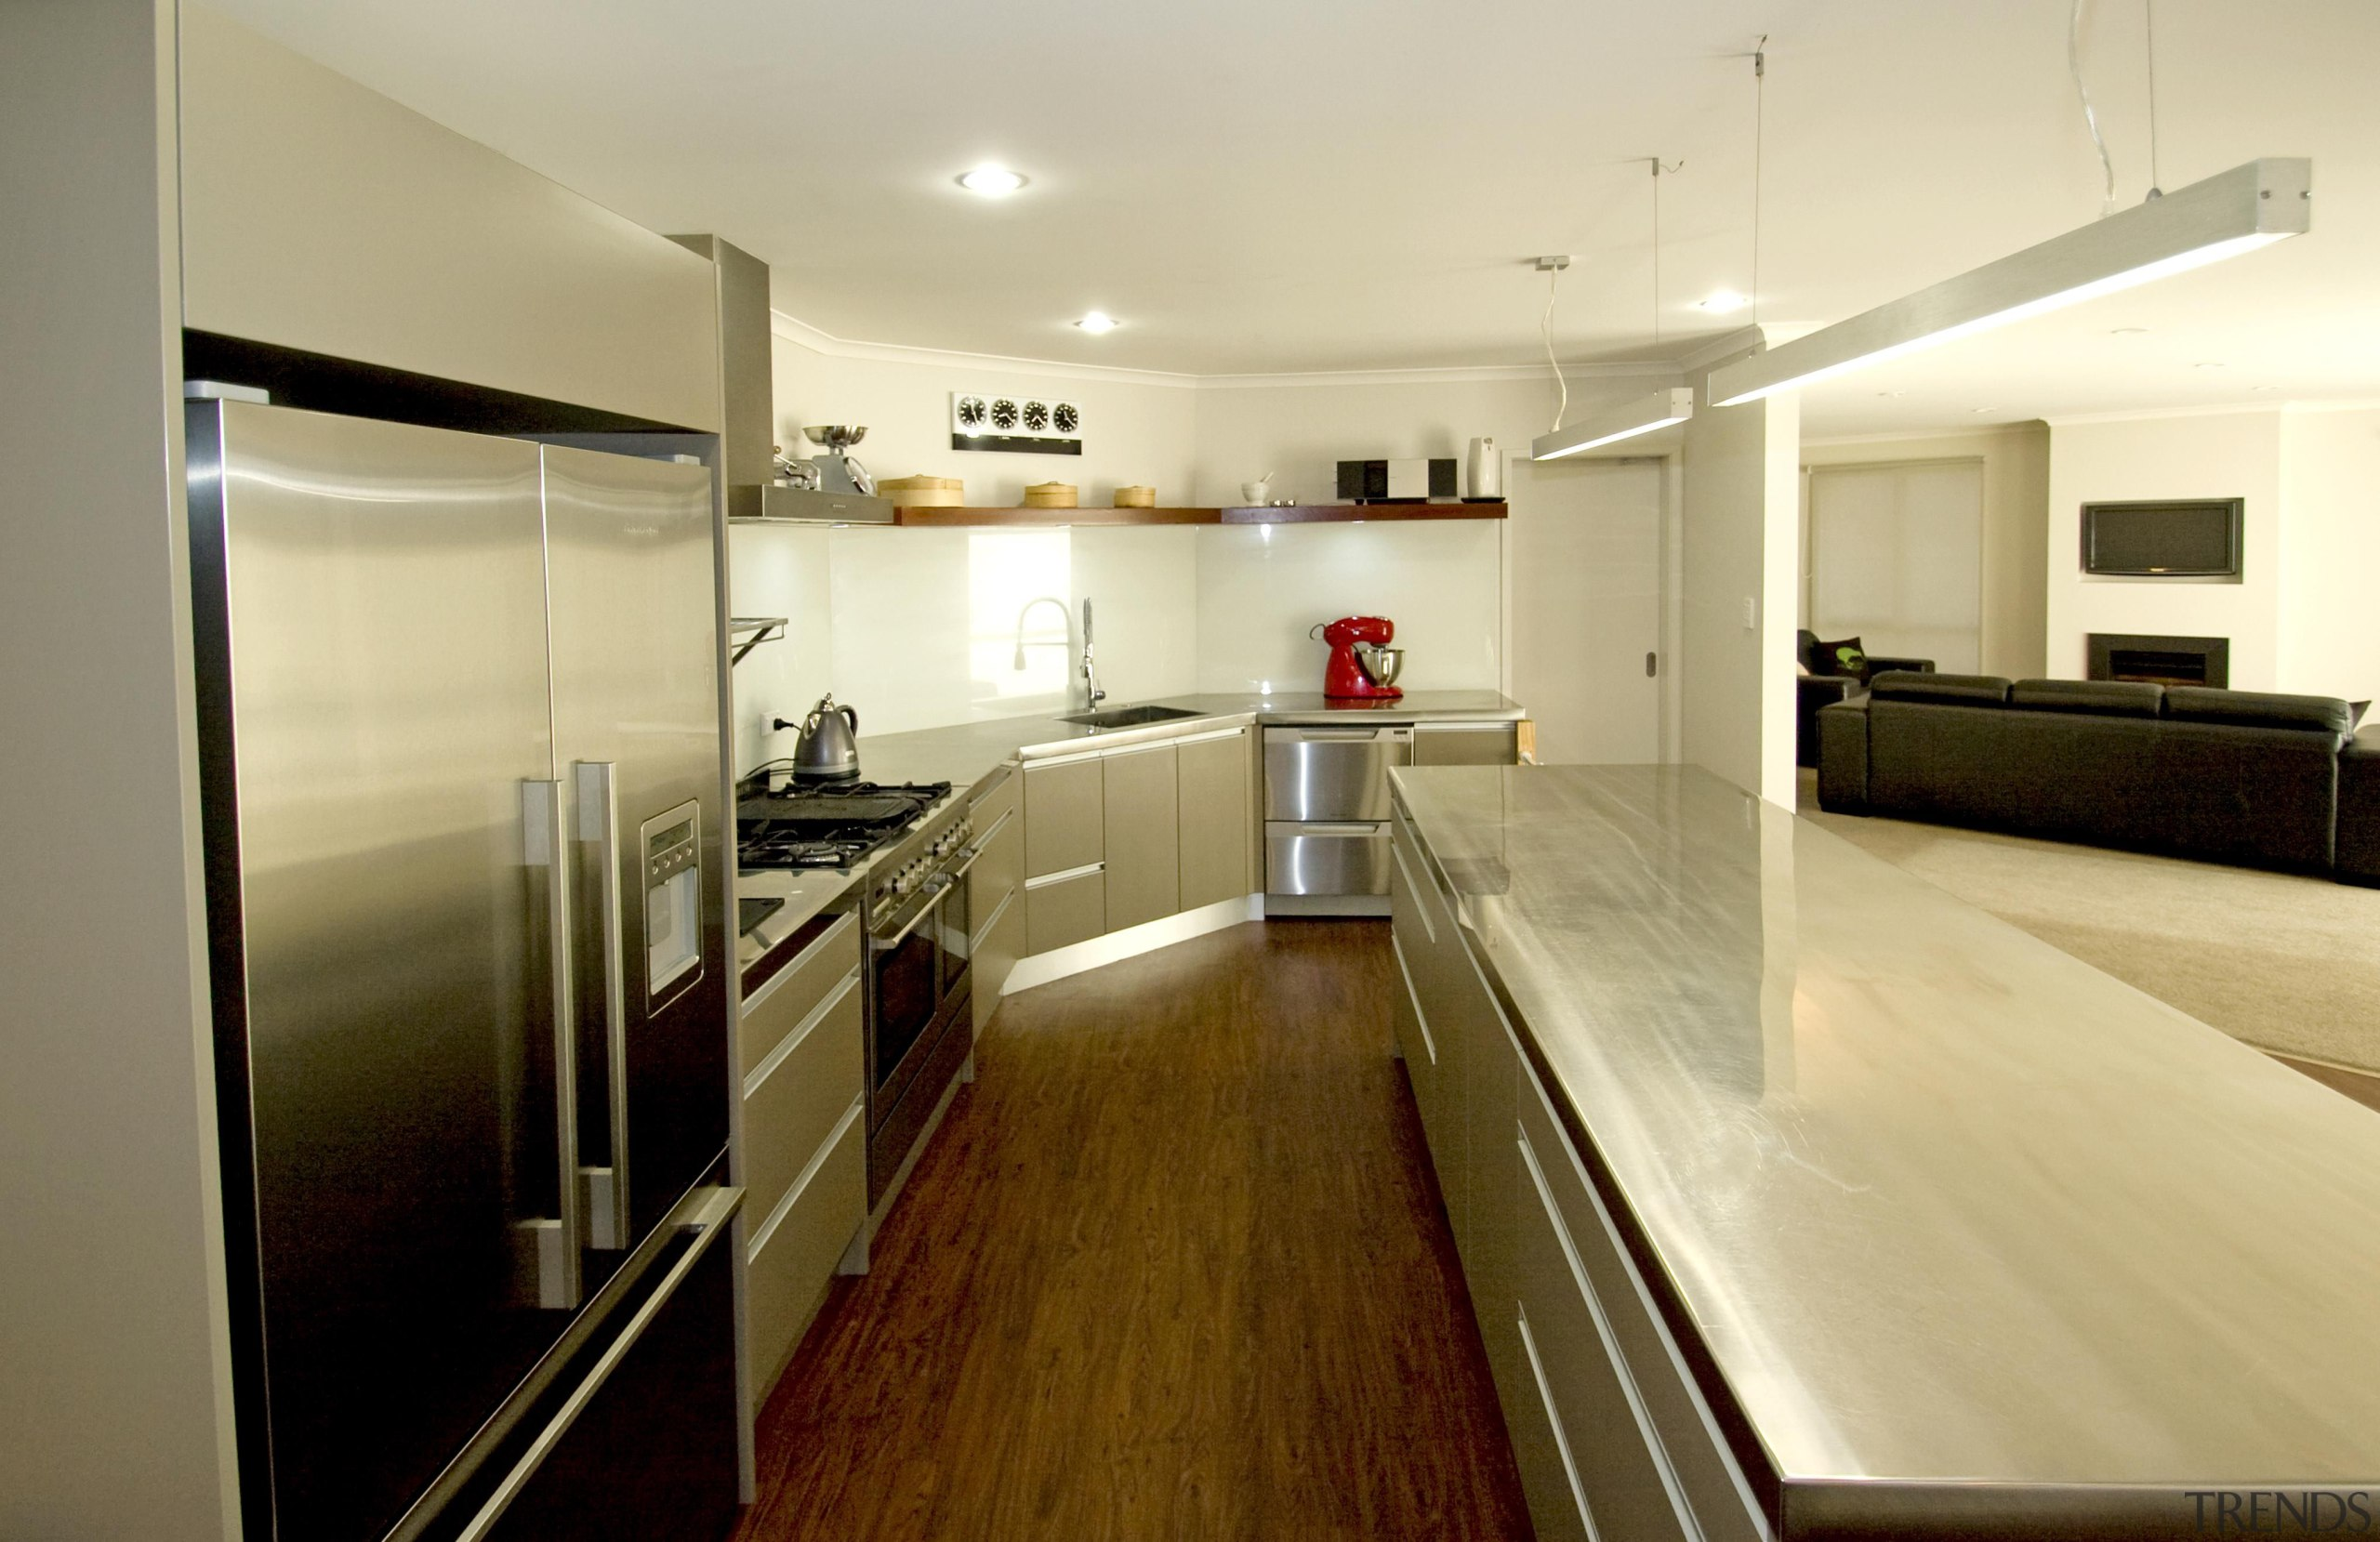 For more information, please visit www.gjgardner.co.nz countertop, floor, flooring, interior design, kitchen, real estate, room, yellow, brown